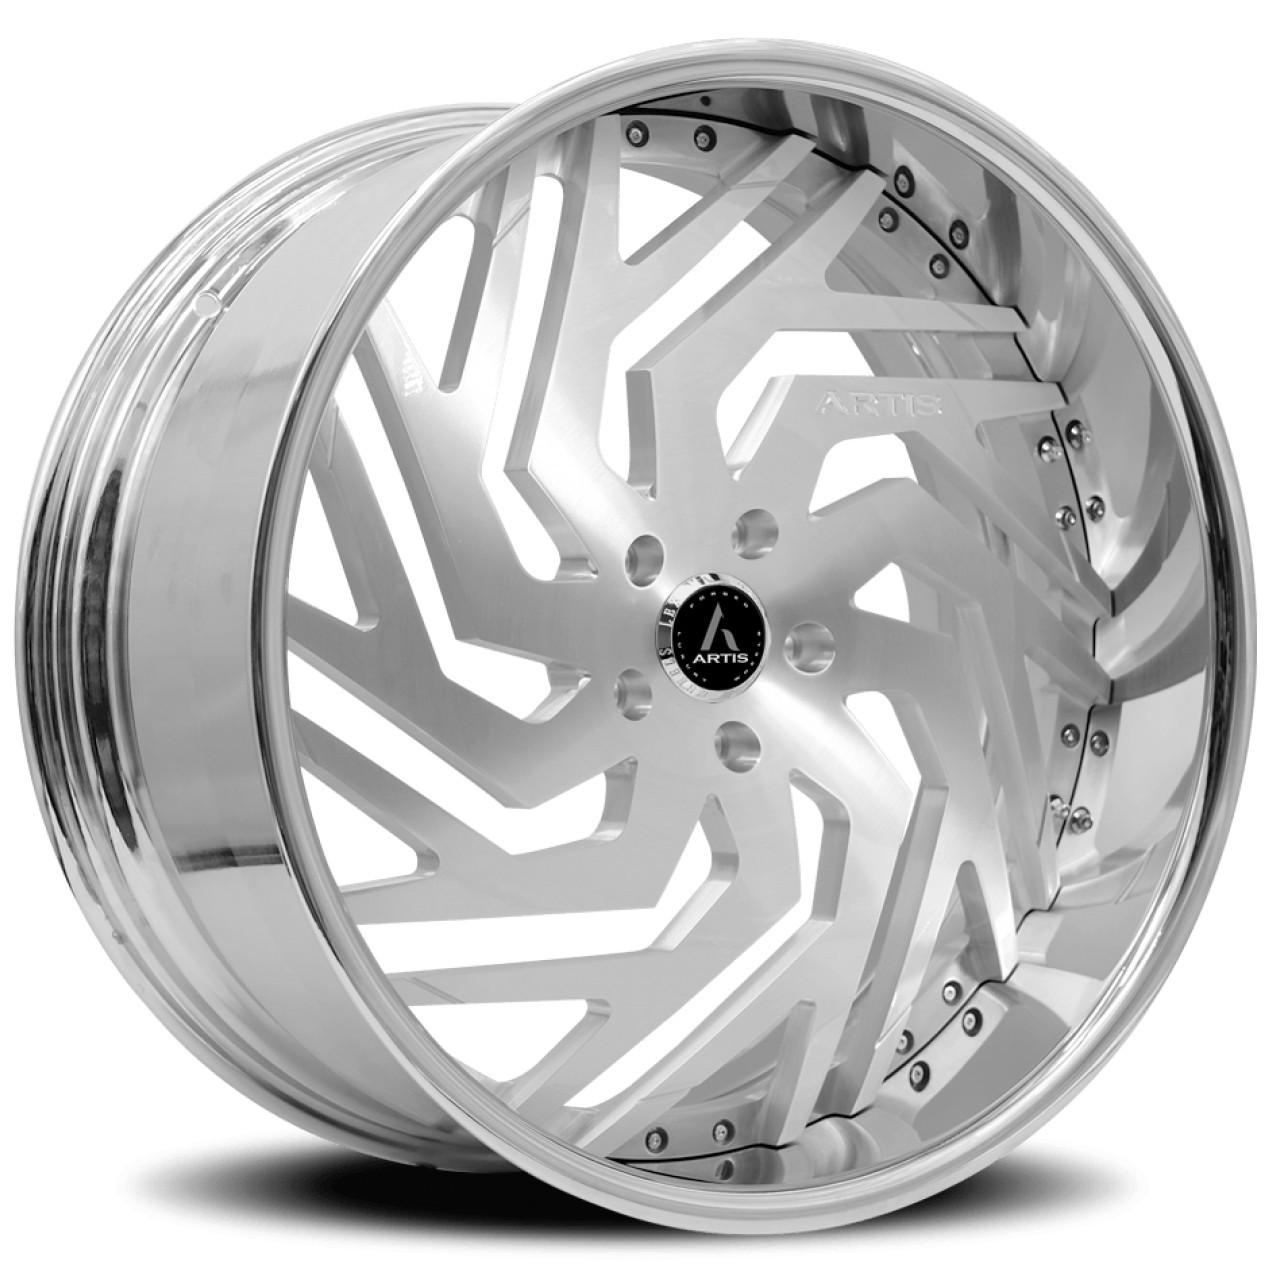 Artis Cicero forged wheels